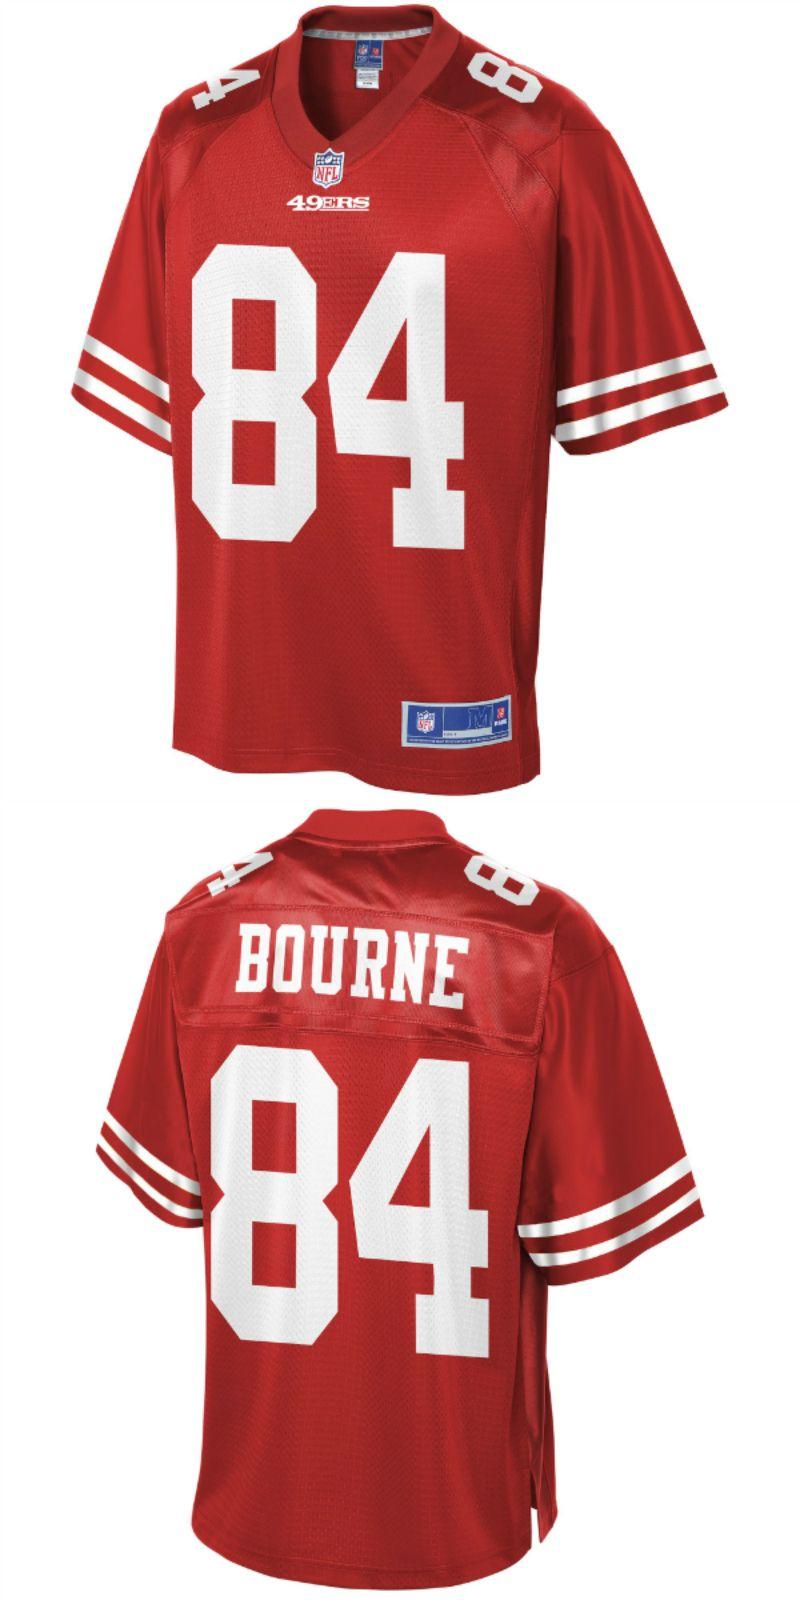 buy online 3bf6f ab501 UP TO 70% OFF. Kendrick Bourne San Francisco 49ers NFL Pro ...